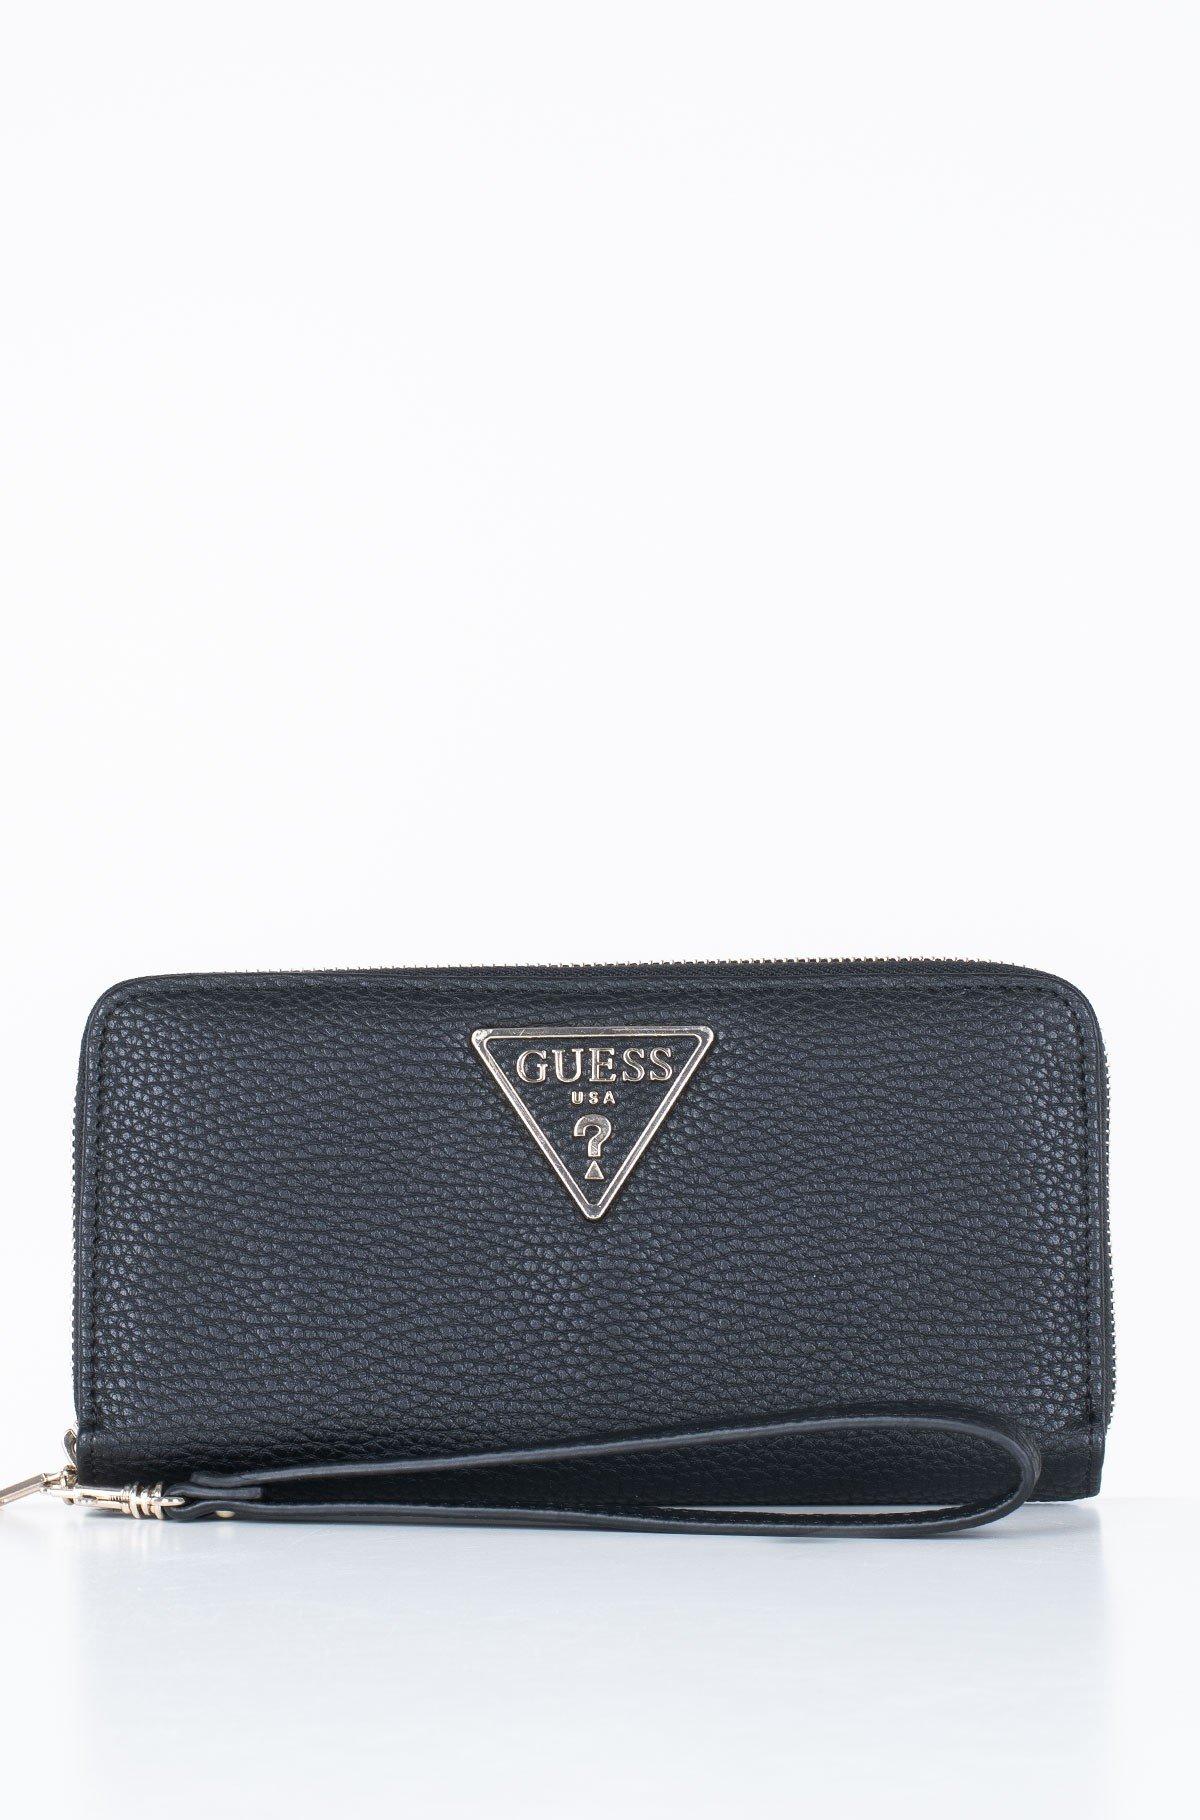 Wallet SWVG74 39460-full-1